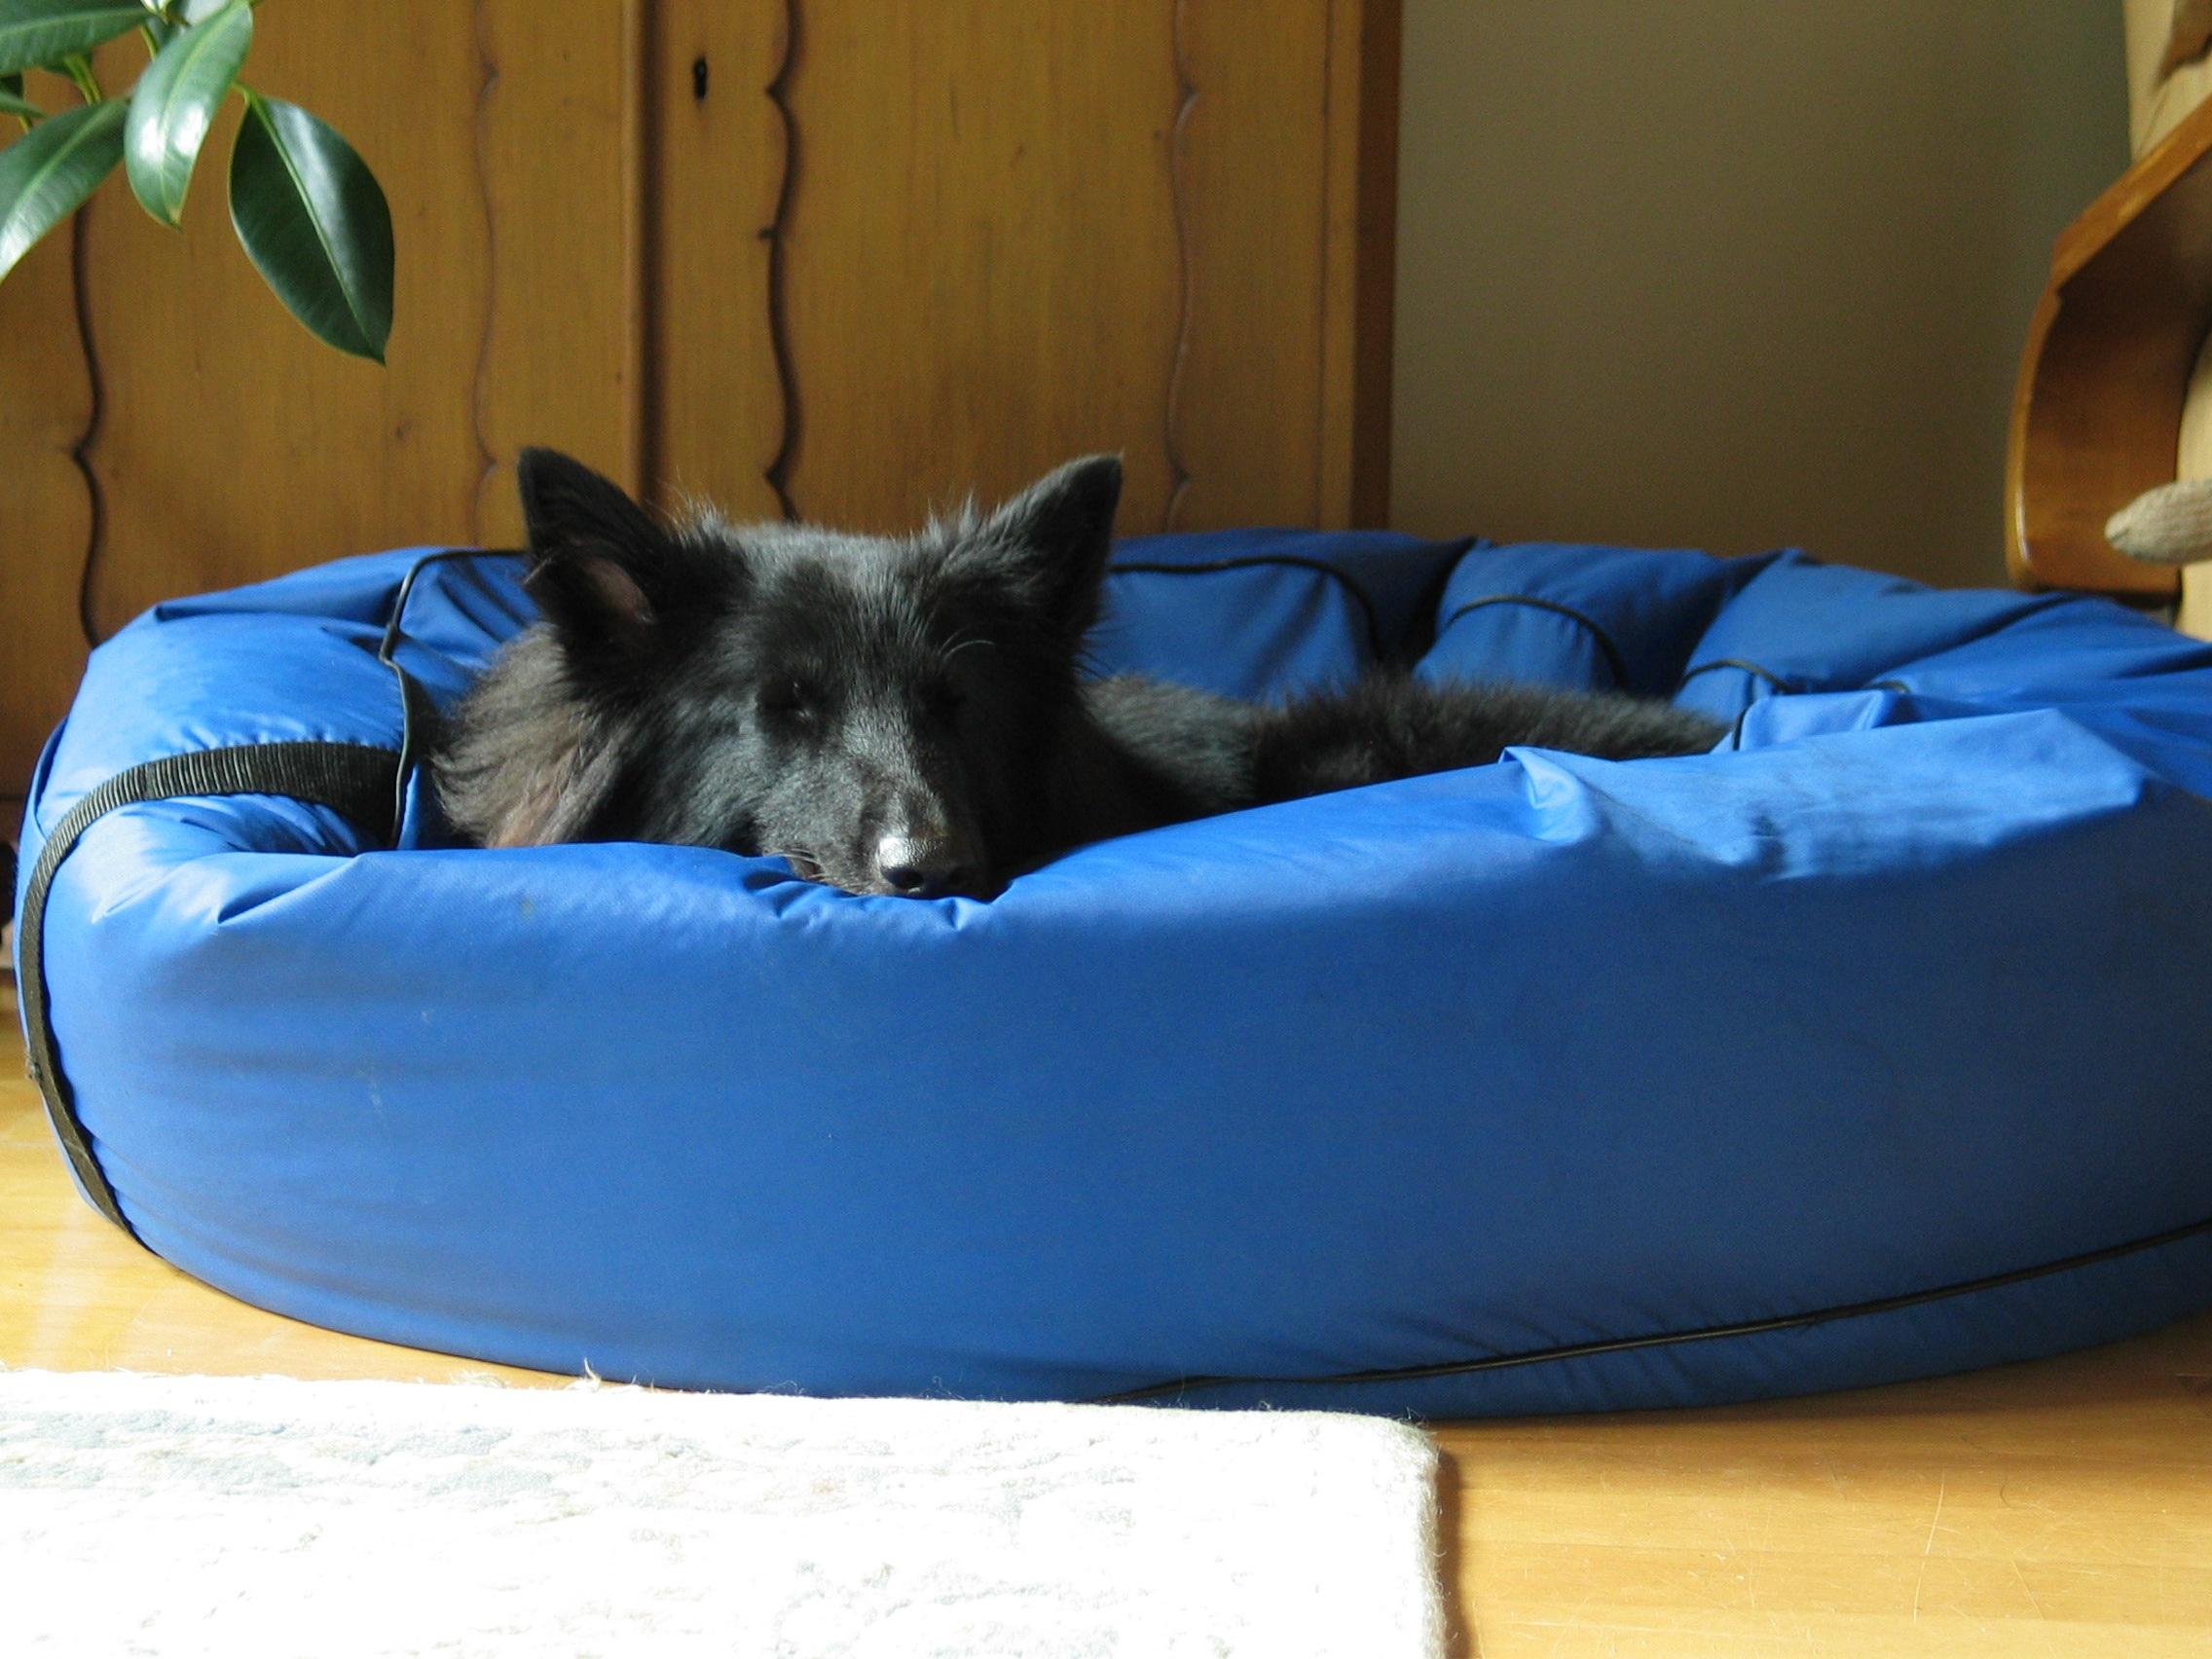 Fotos gratis : casa, perro, animal, linda, mascota, gato, azul ...